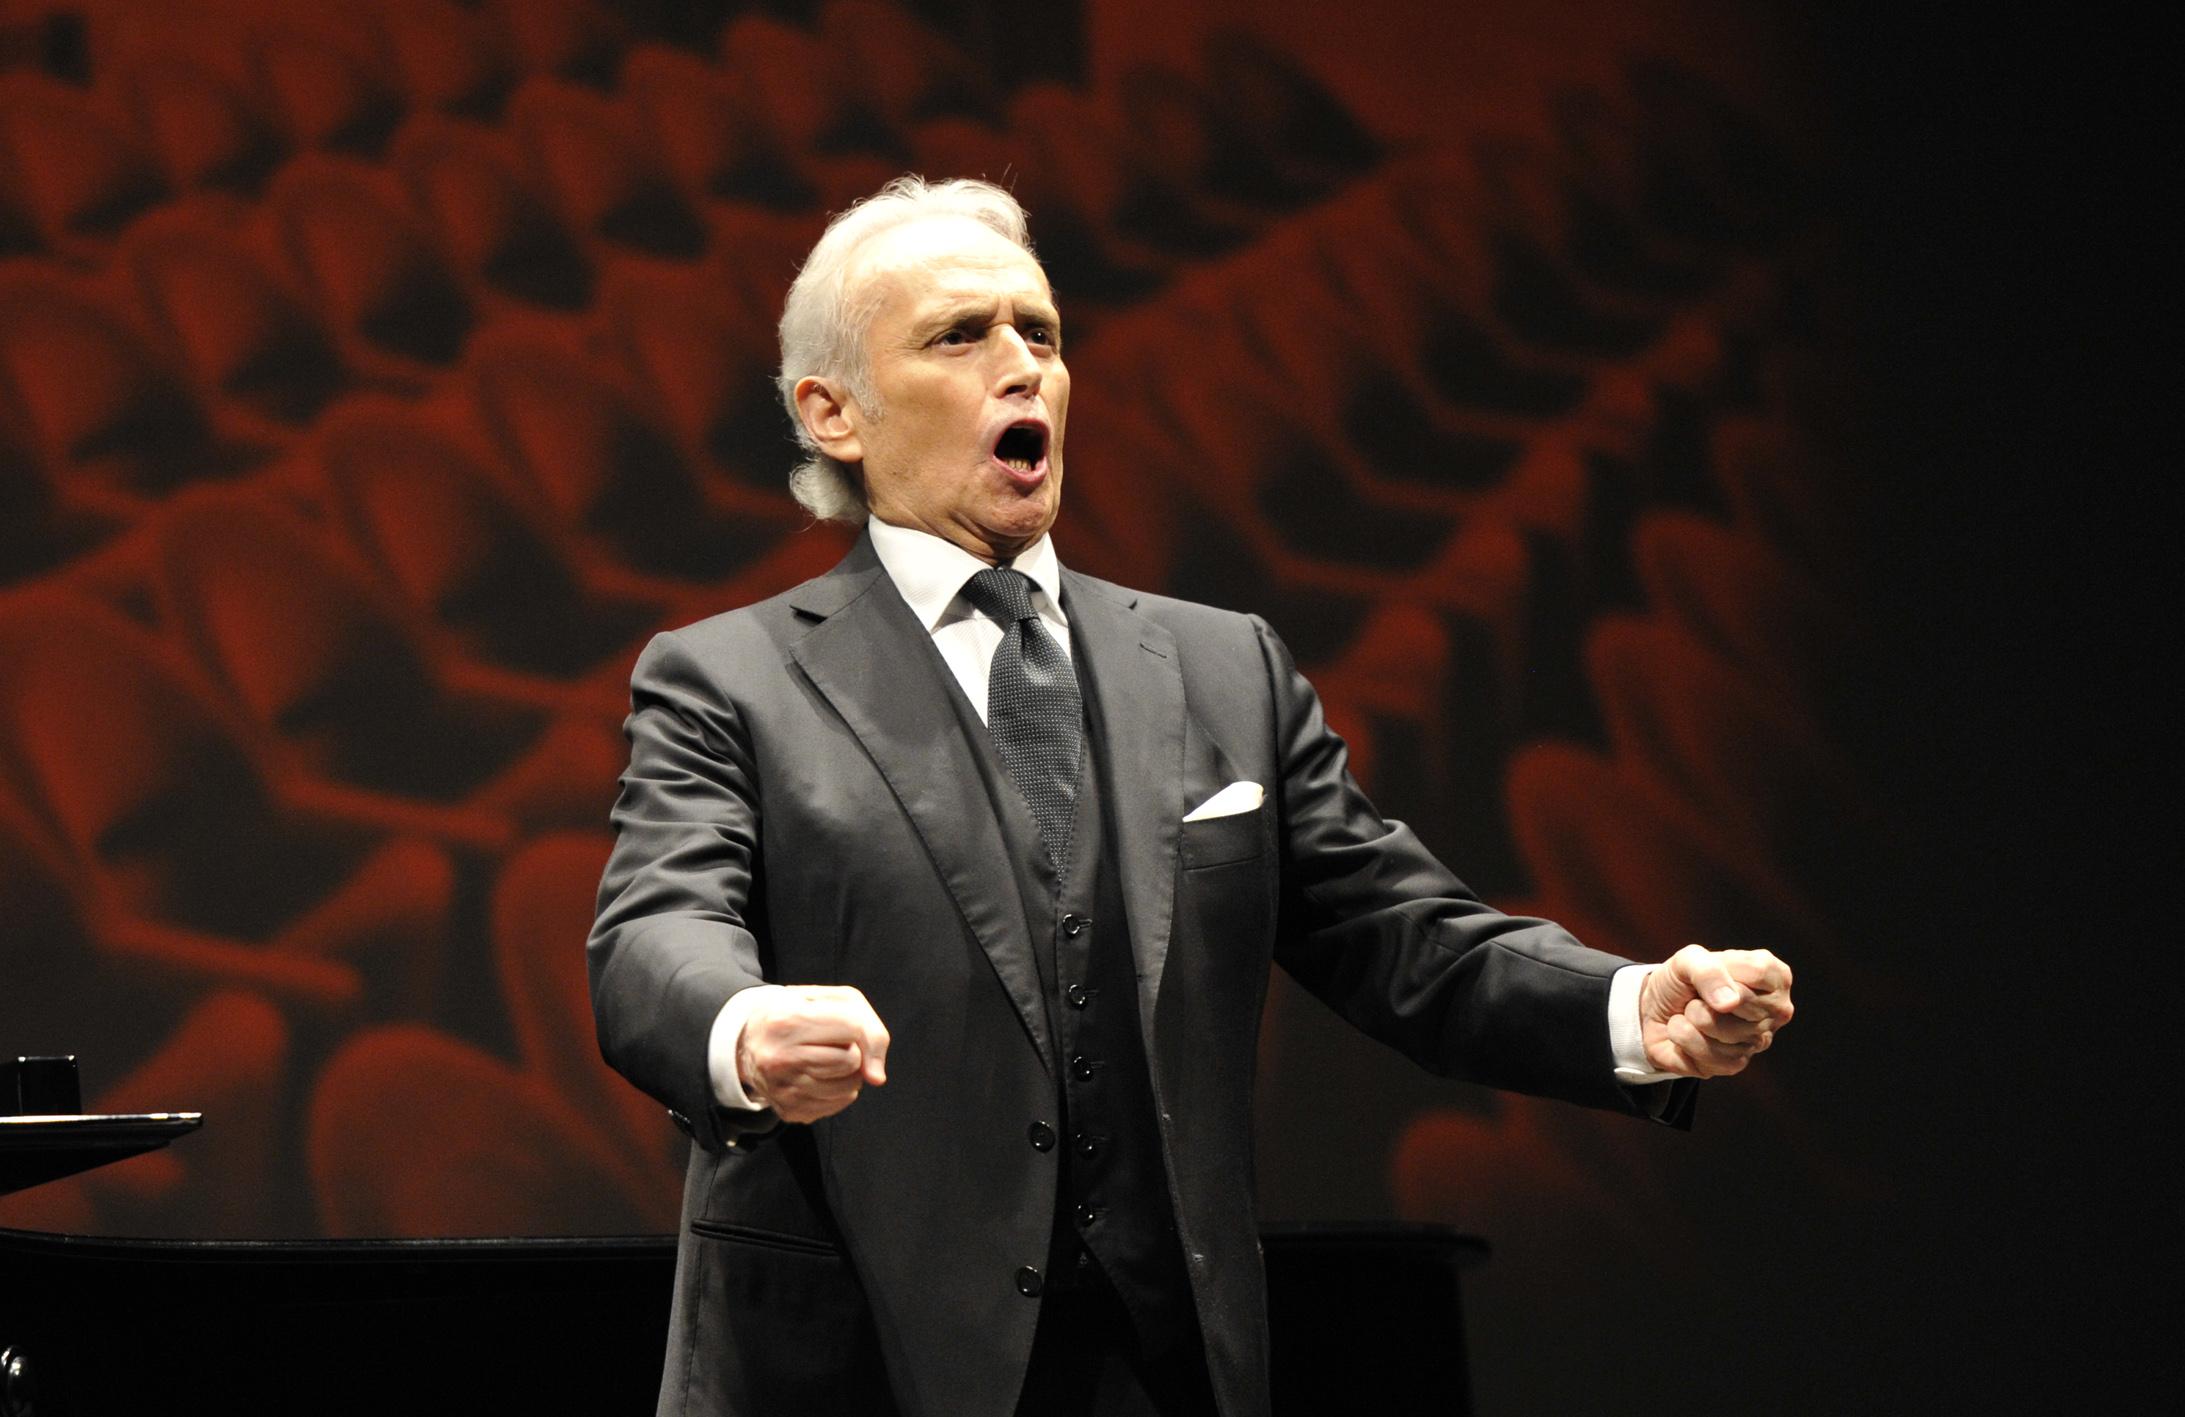 José Carreras in concerto al Teatro del Giglio (Foto Alcide, Lucca)